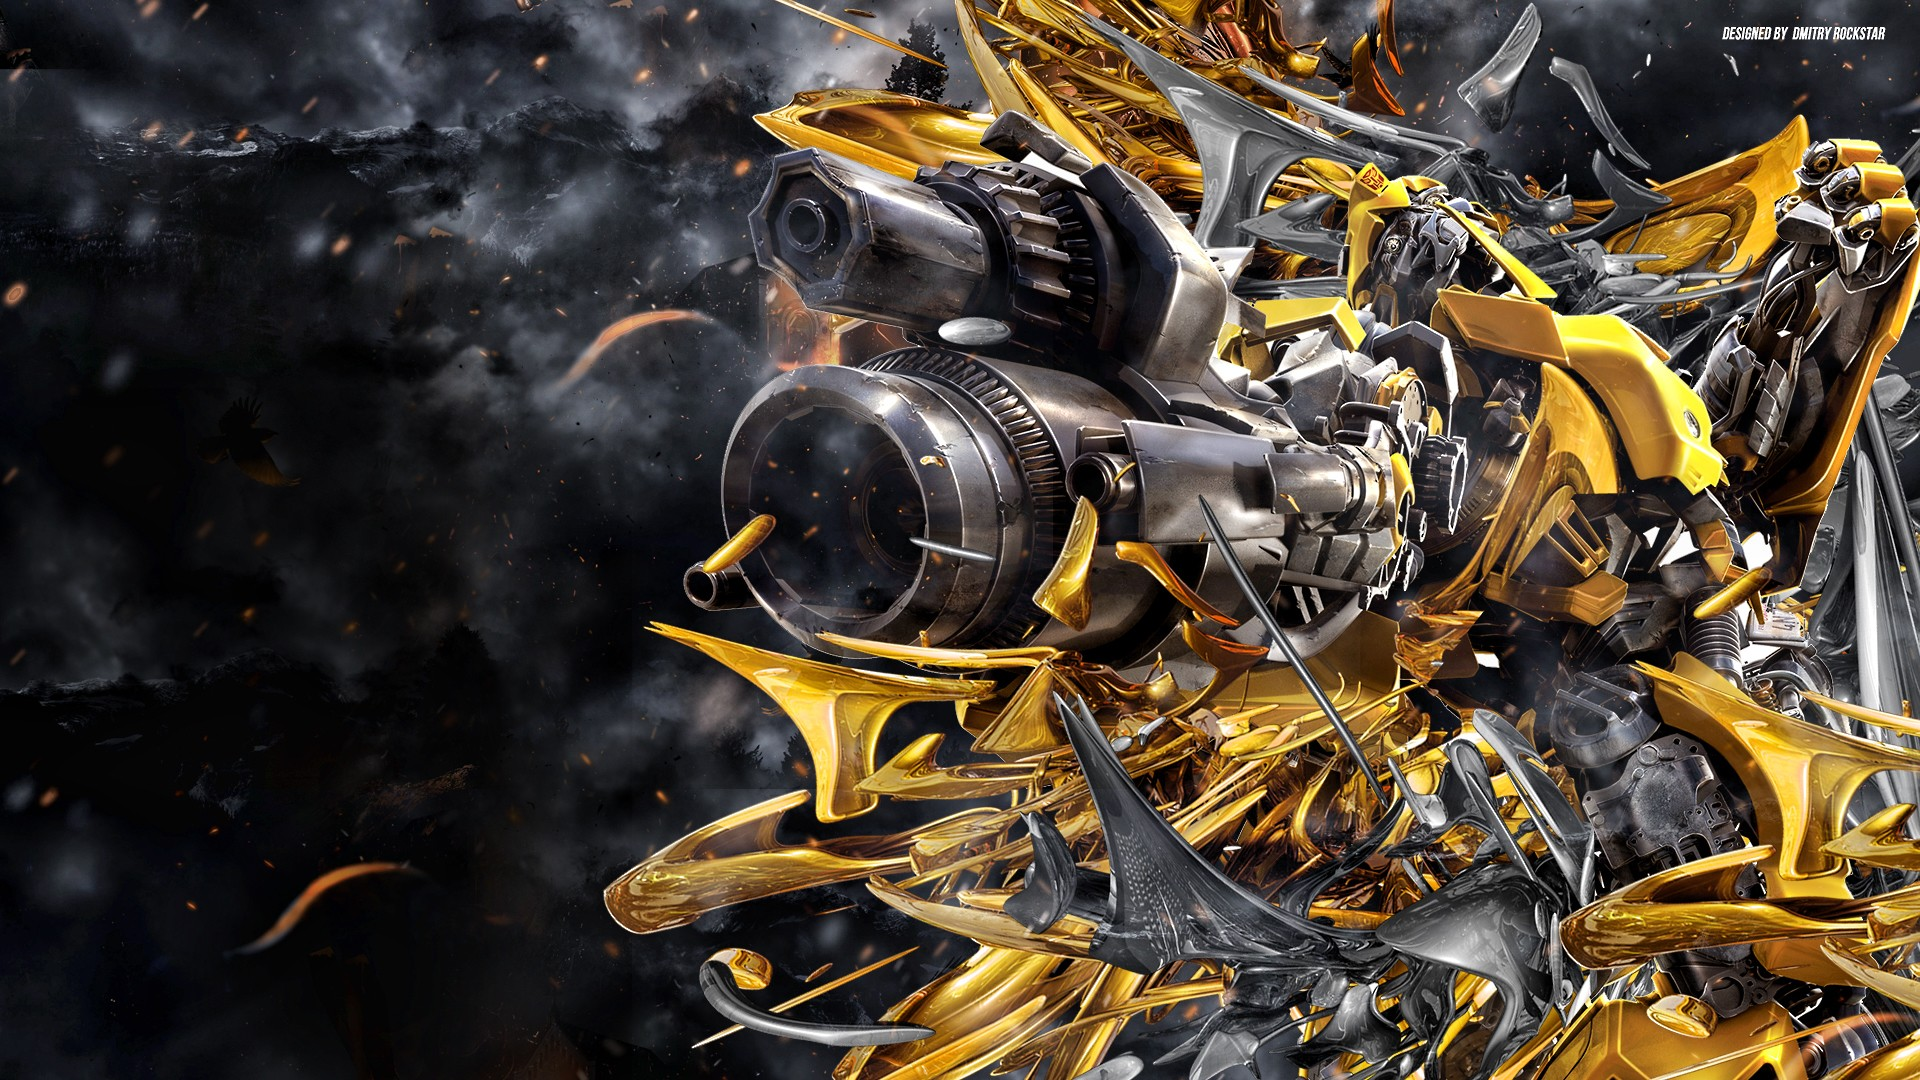 Transformers Wallpaper Bumblebee Car   Viewing Gallery 1920x1080